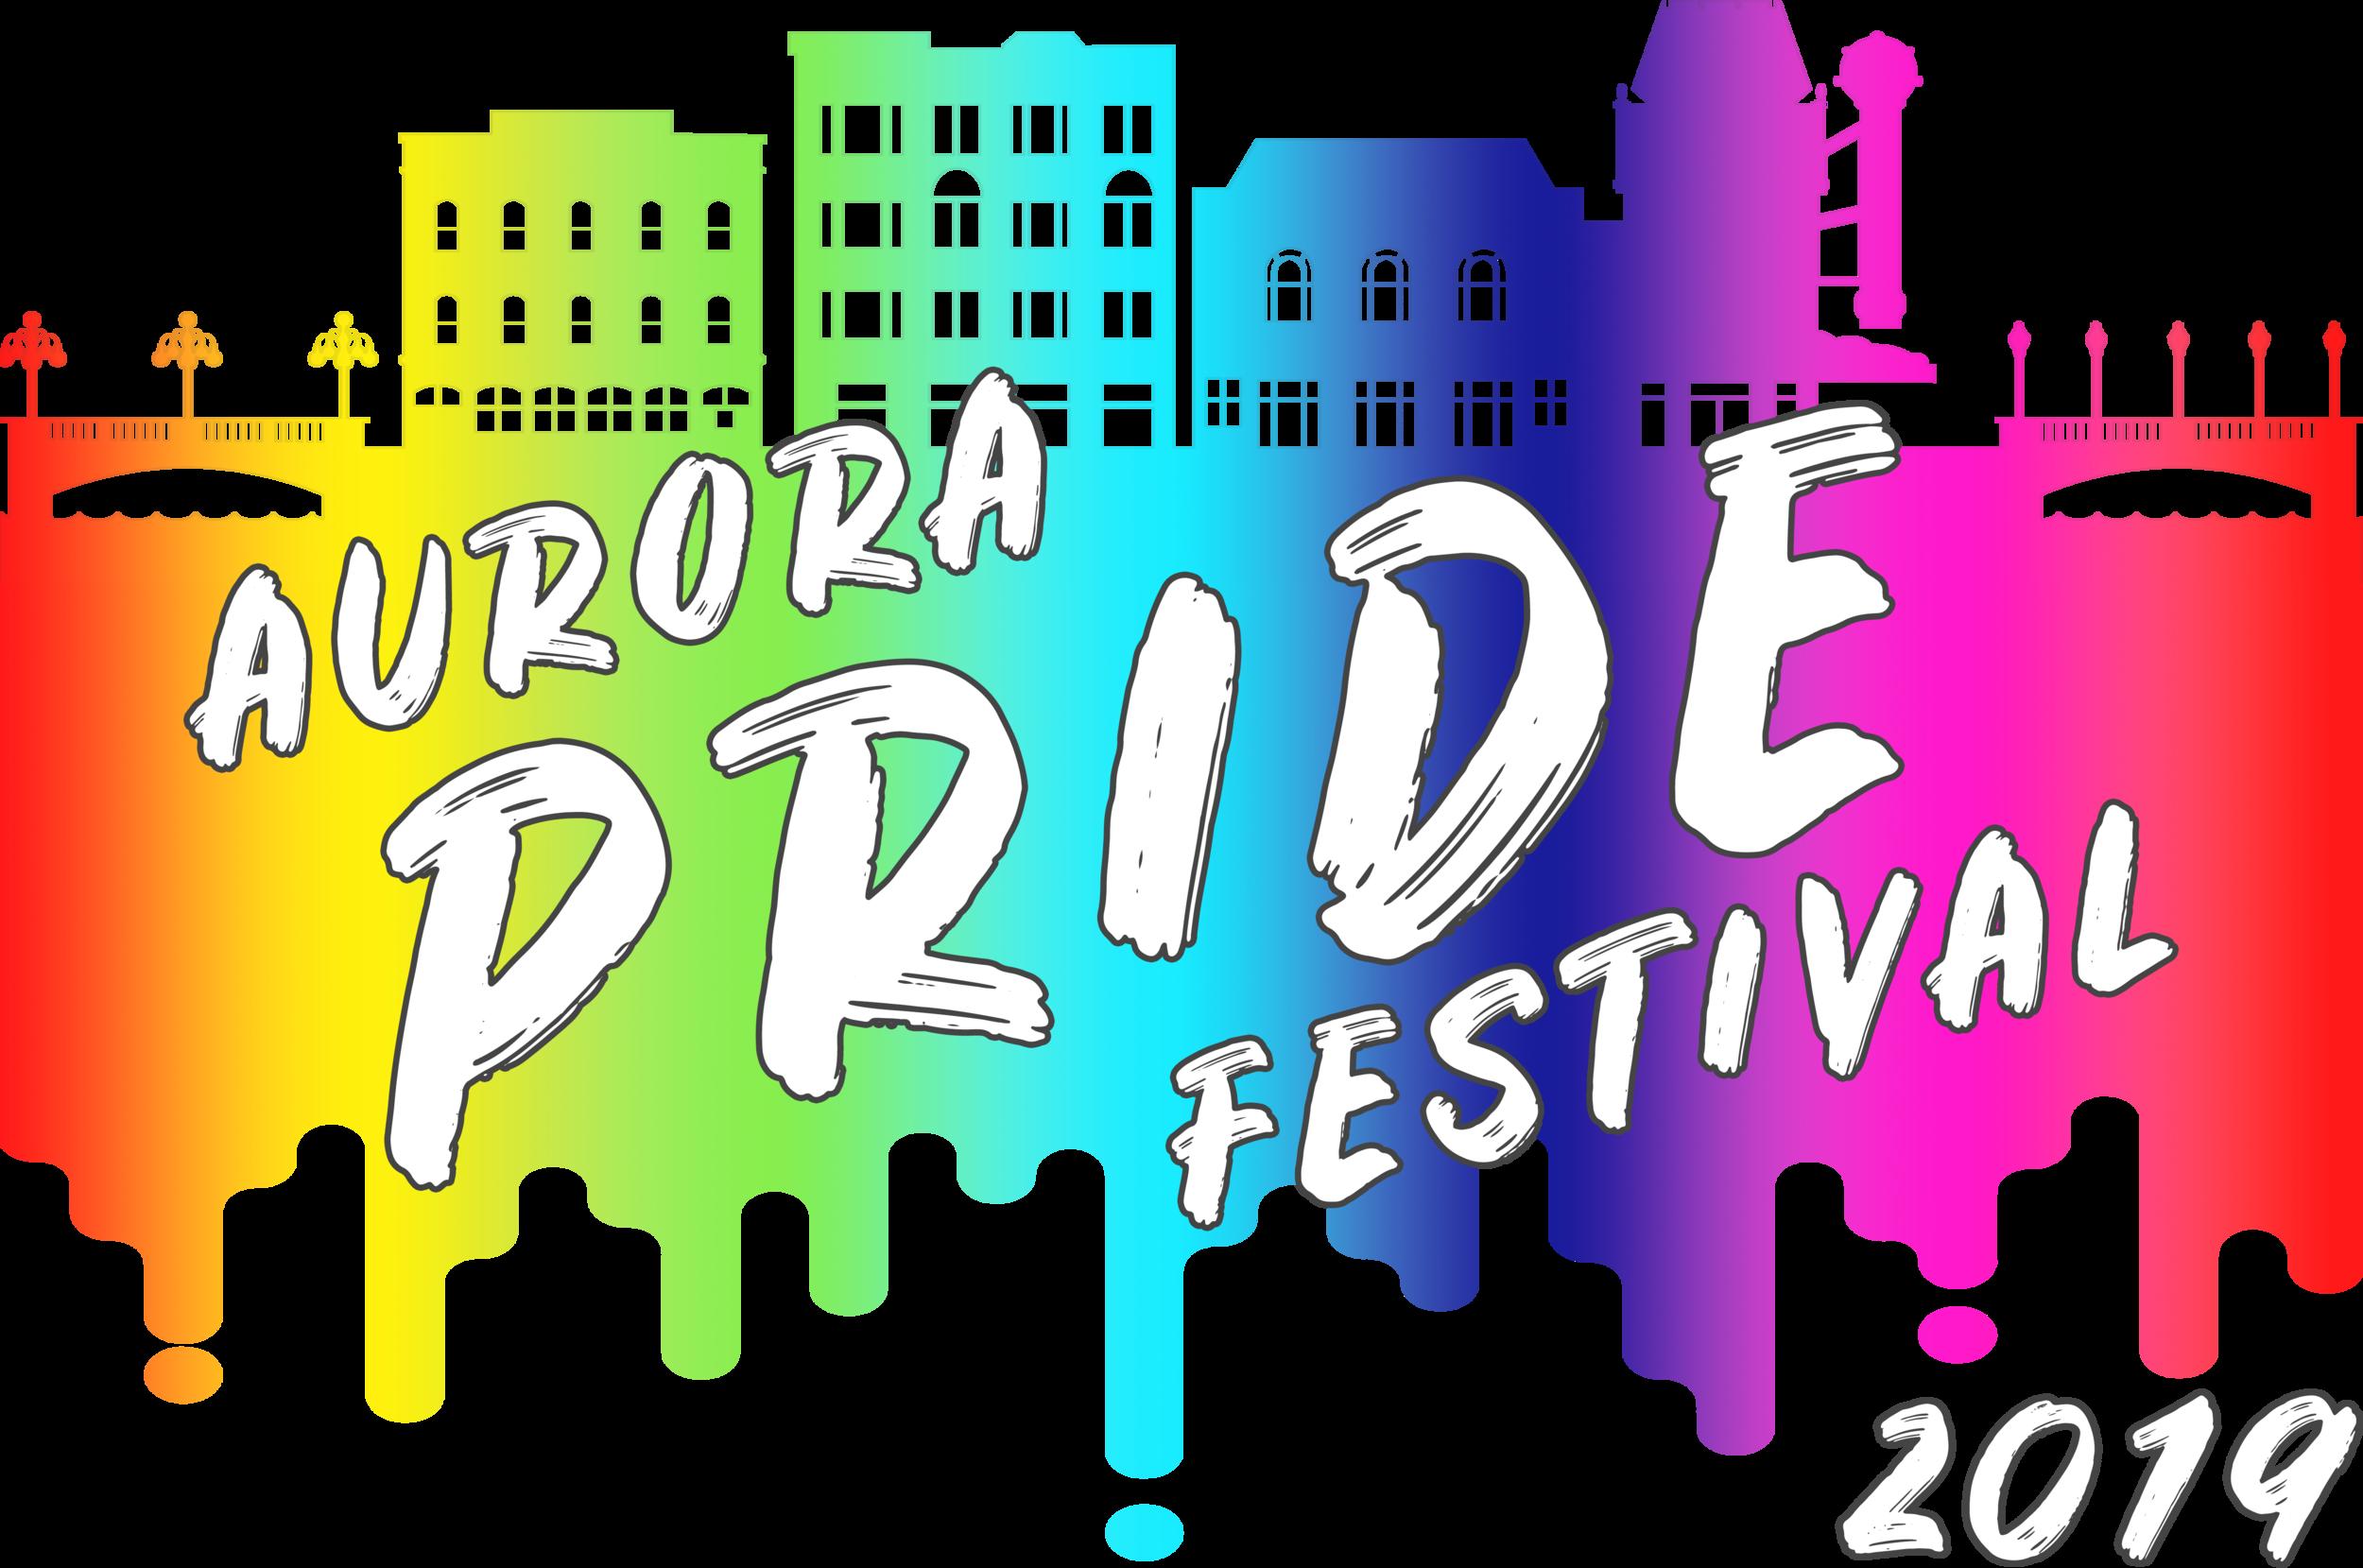 AuroraPrideFestivalLogo2019.png